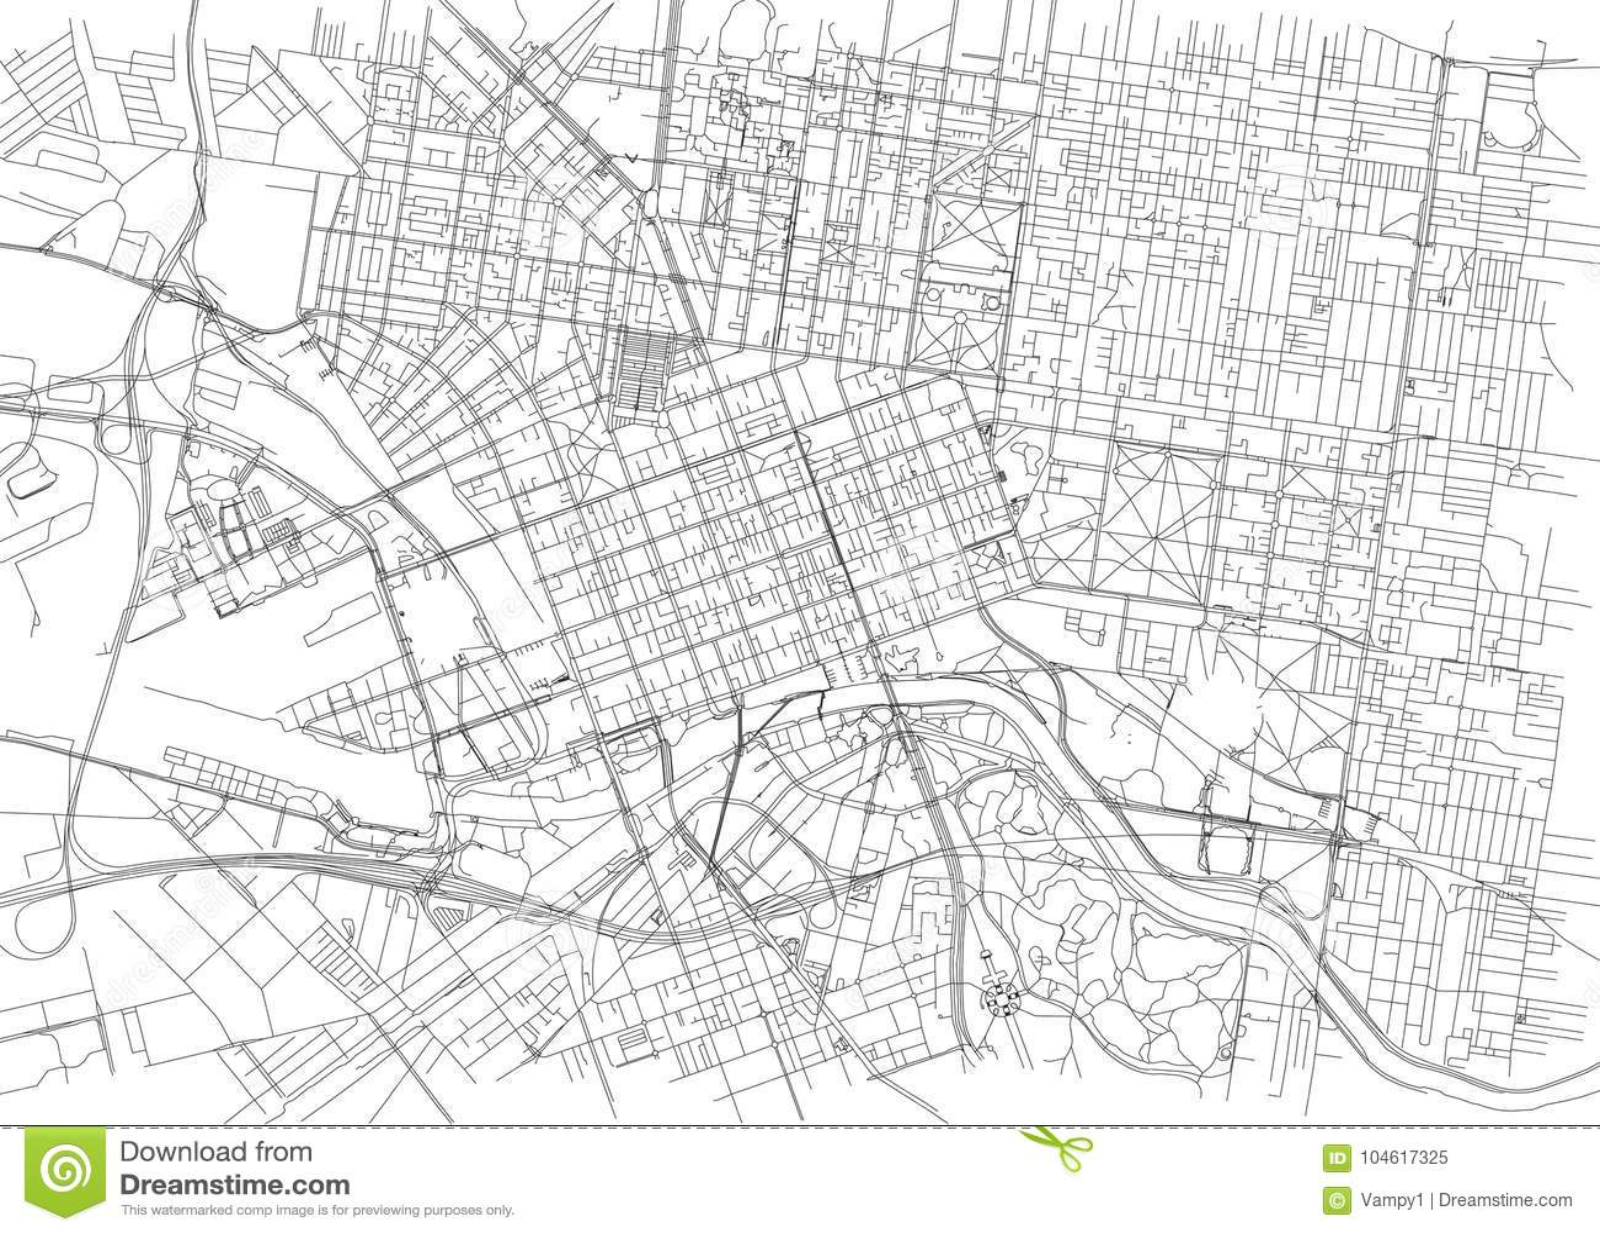 Melbourne Australia City Map.Streets Of Melbourne City Map Australia Stock Vector